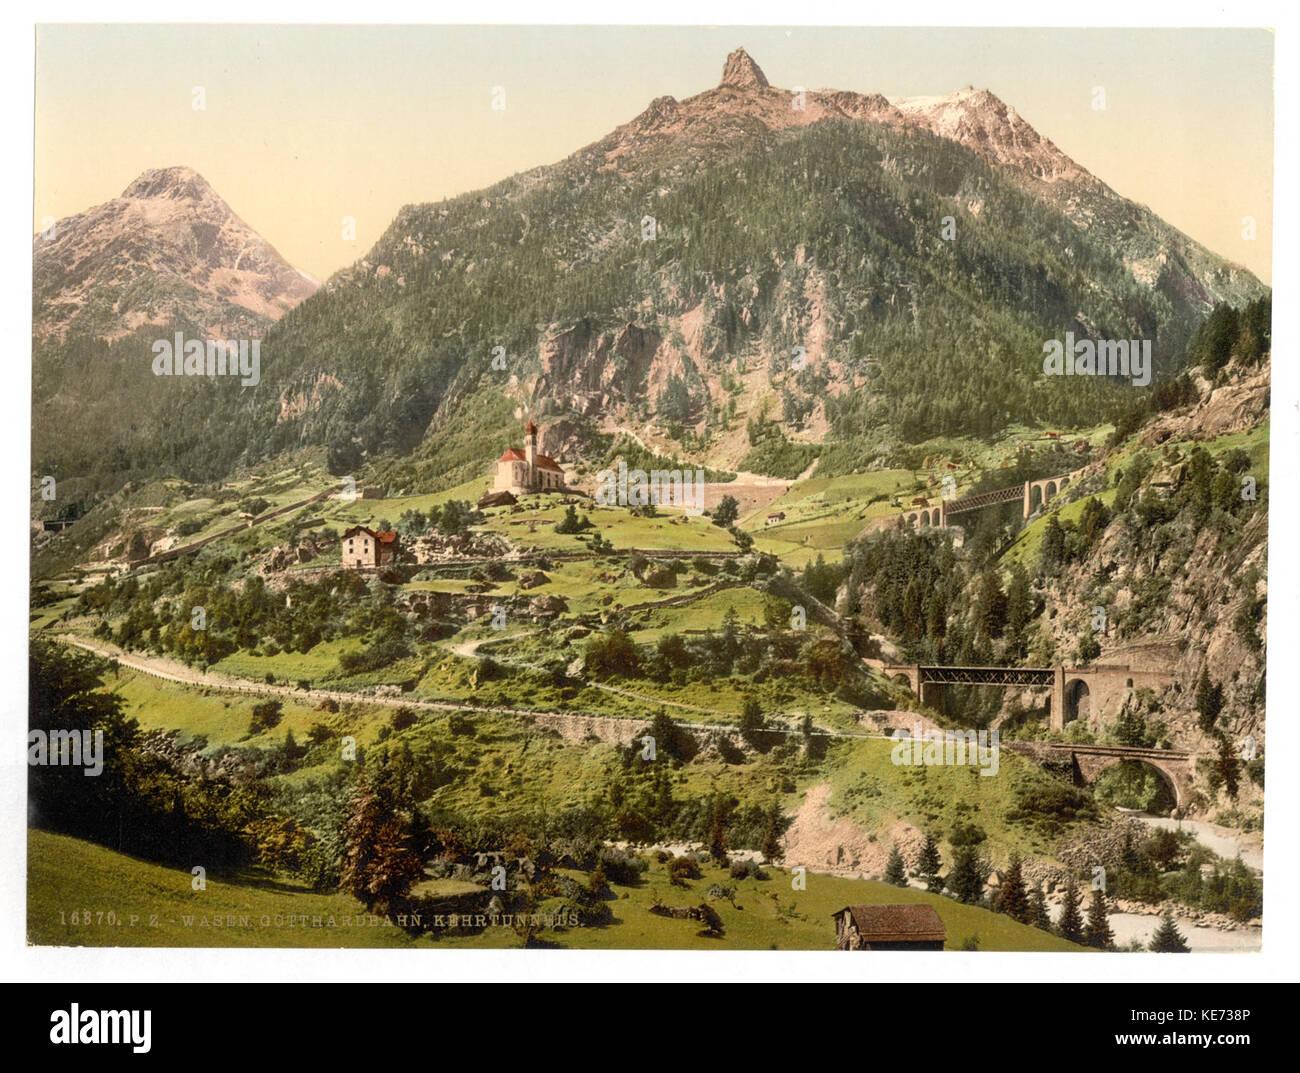 Wassen, the tunnels, St. Gotthard Railway, Switzerland LCCN2001703203 Stock Photo